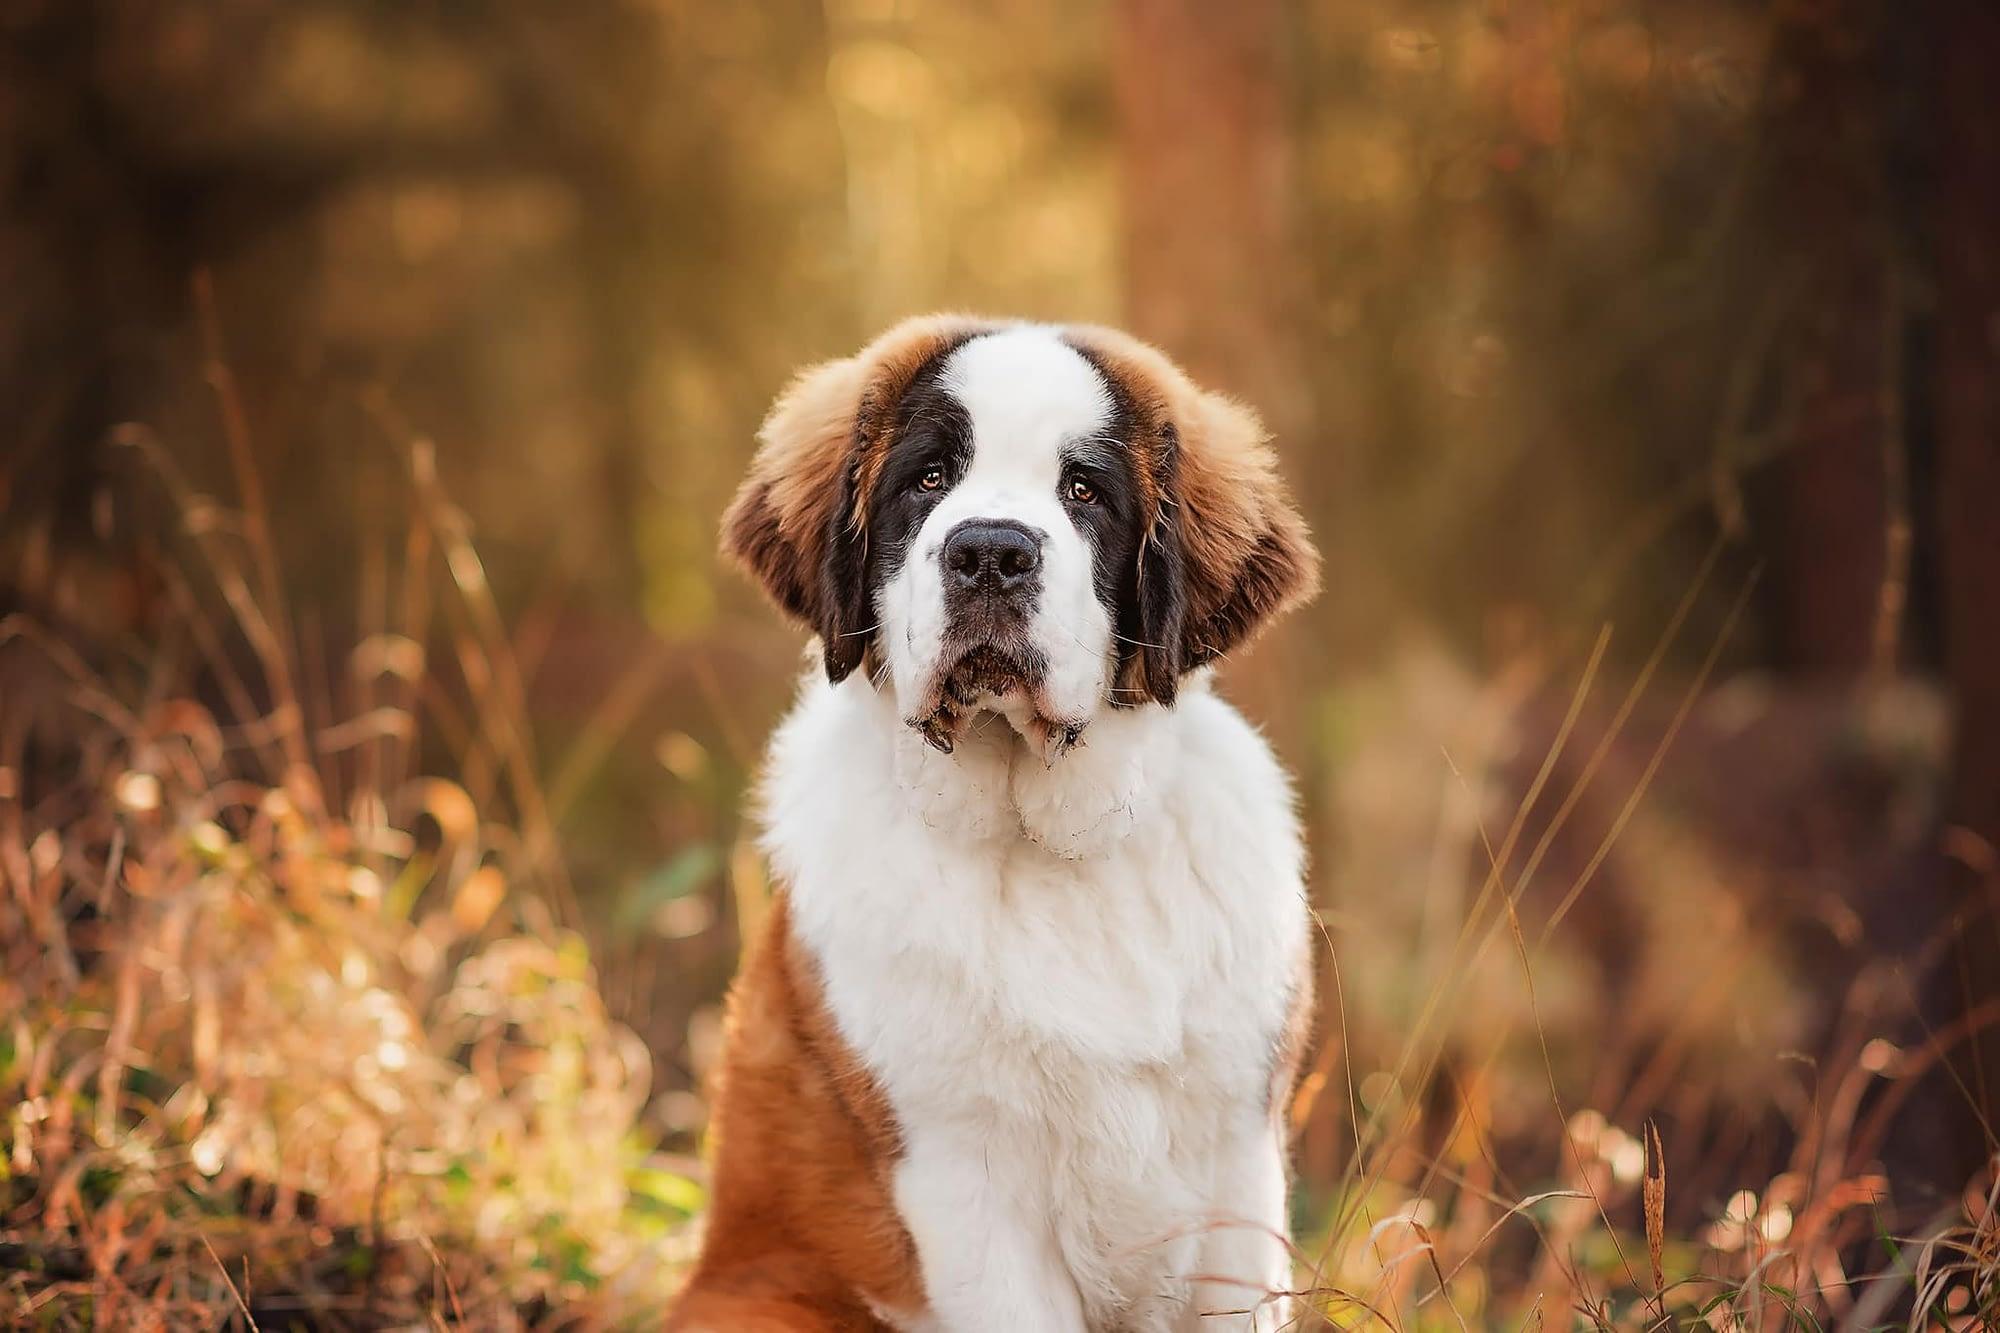 st bernard puppy in woodland northamptonshire